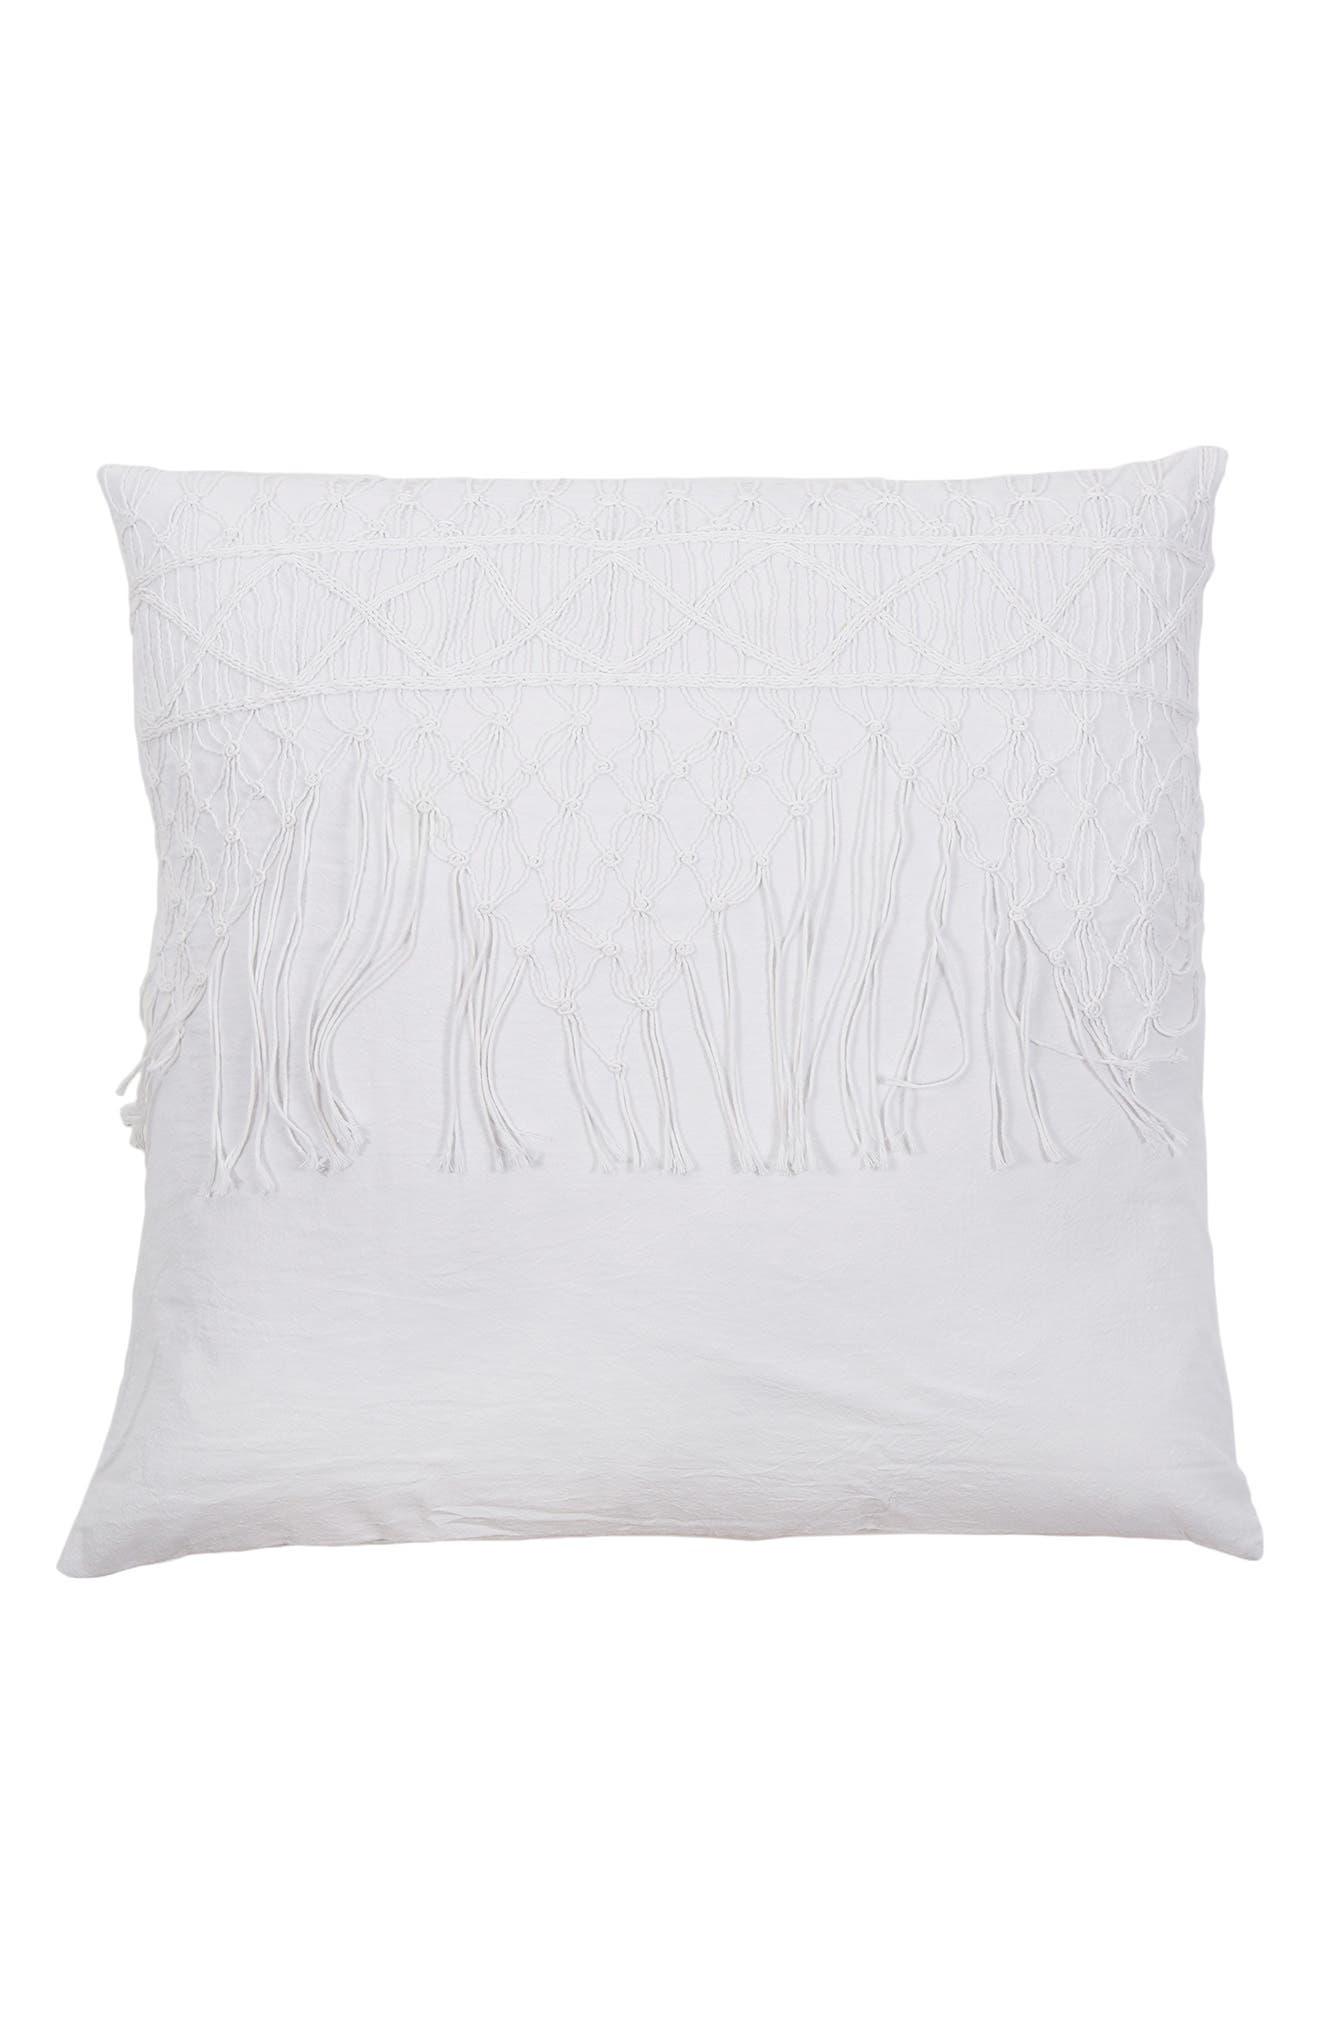 Zoe Accent Pillow Sham,                         Main,                         color, White